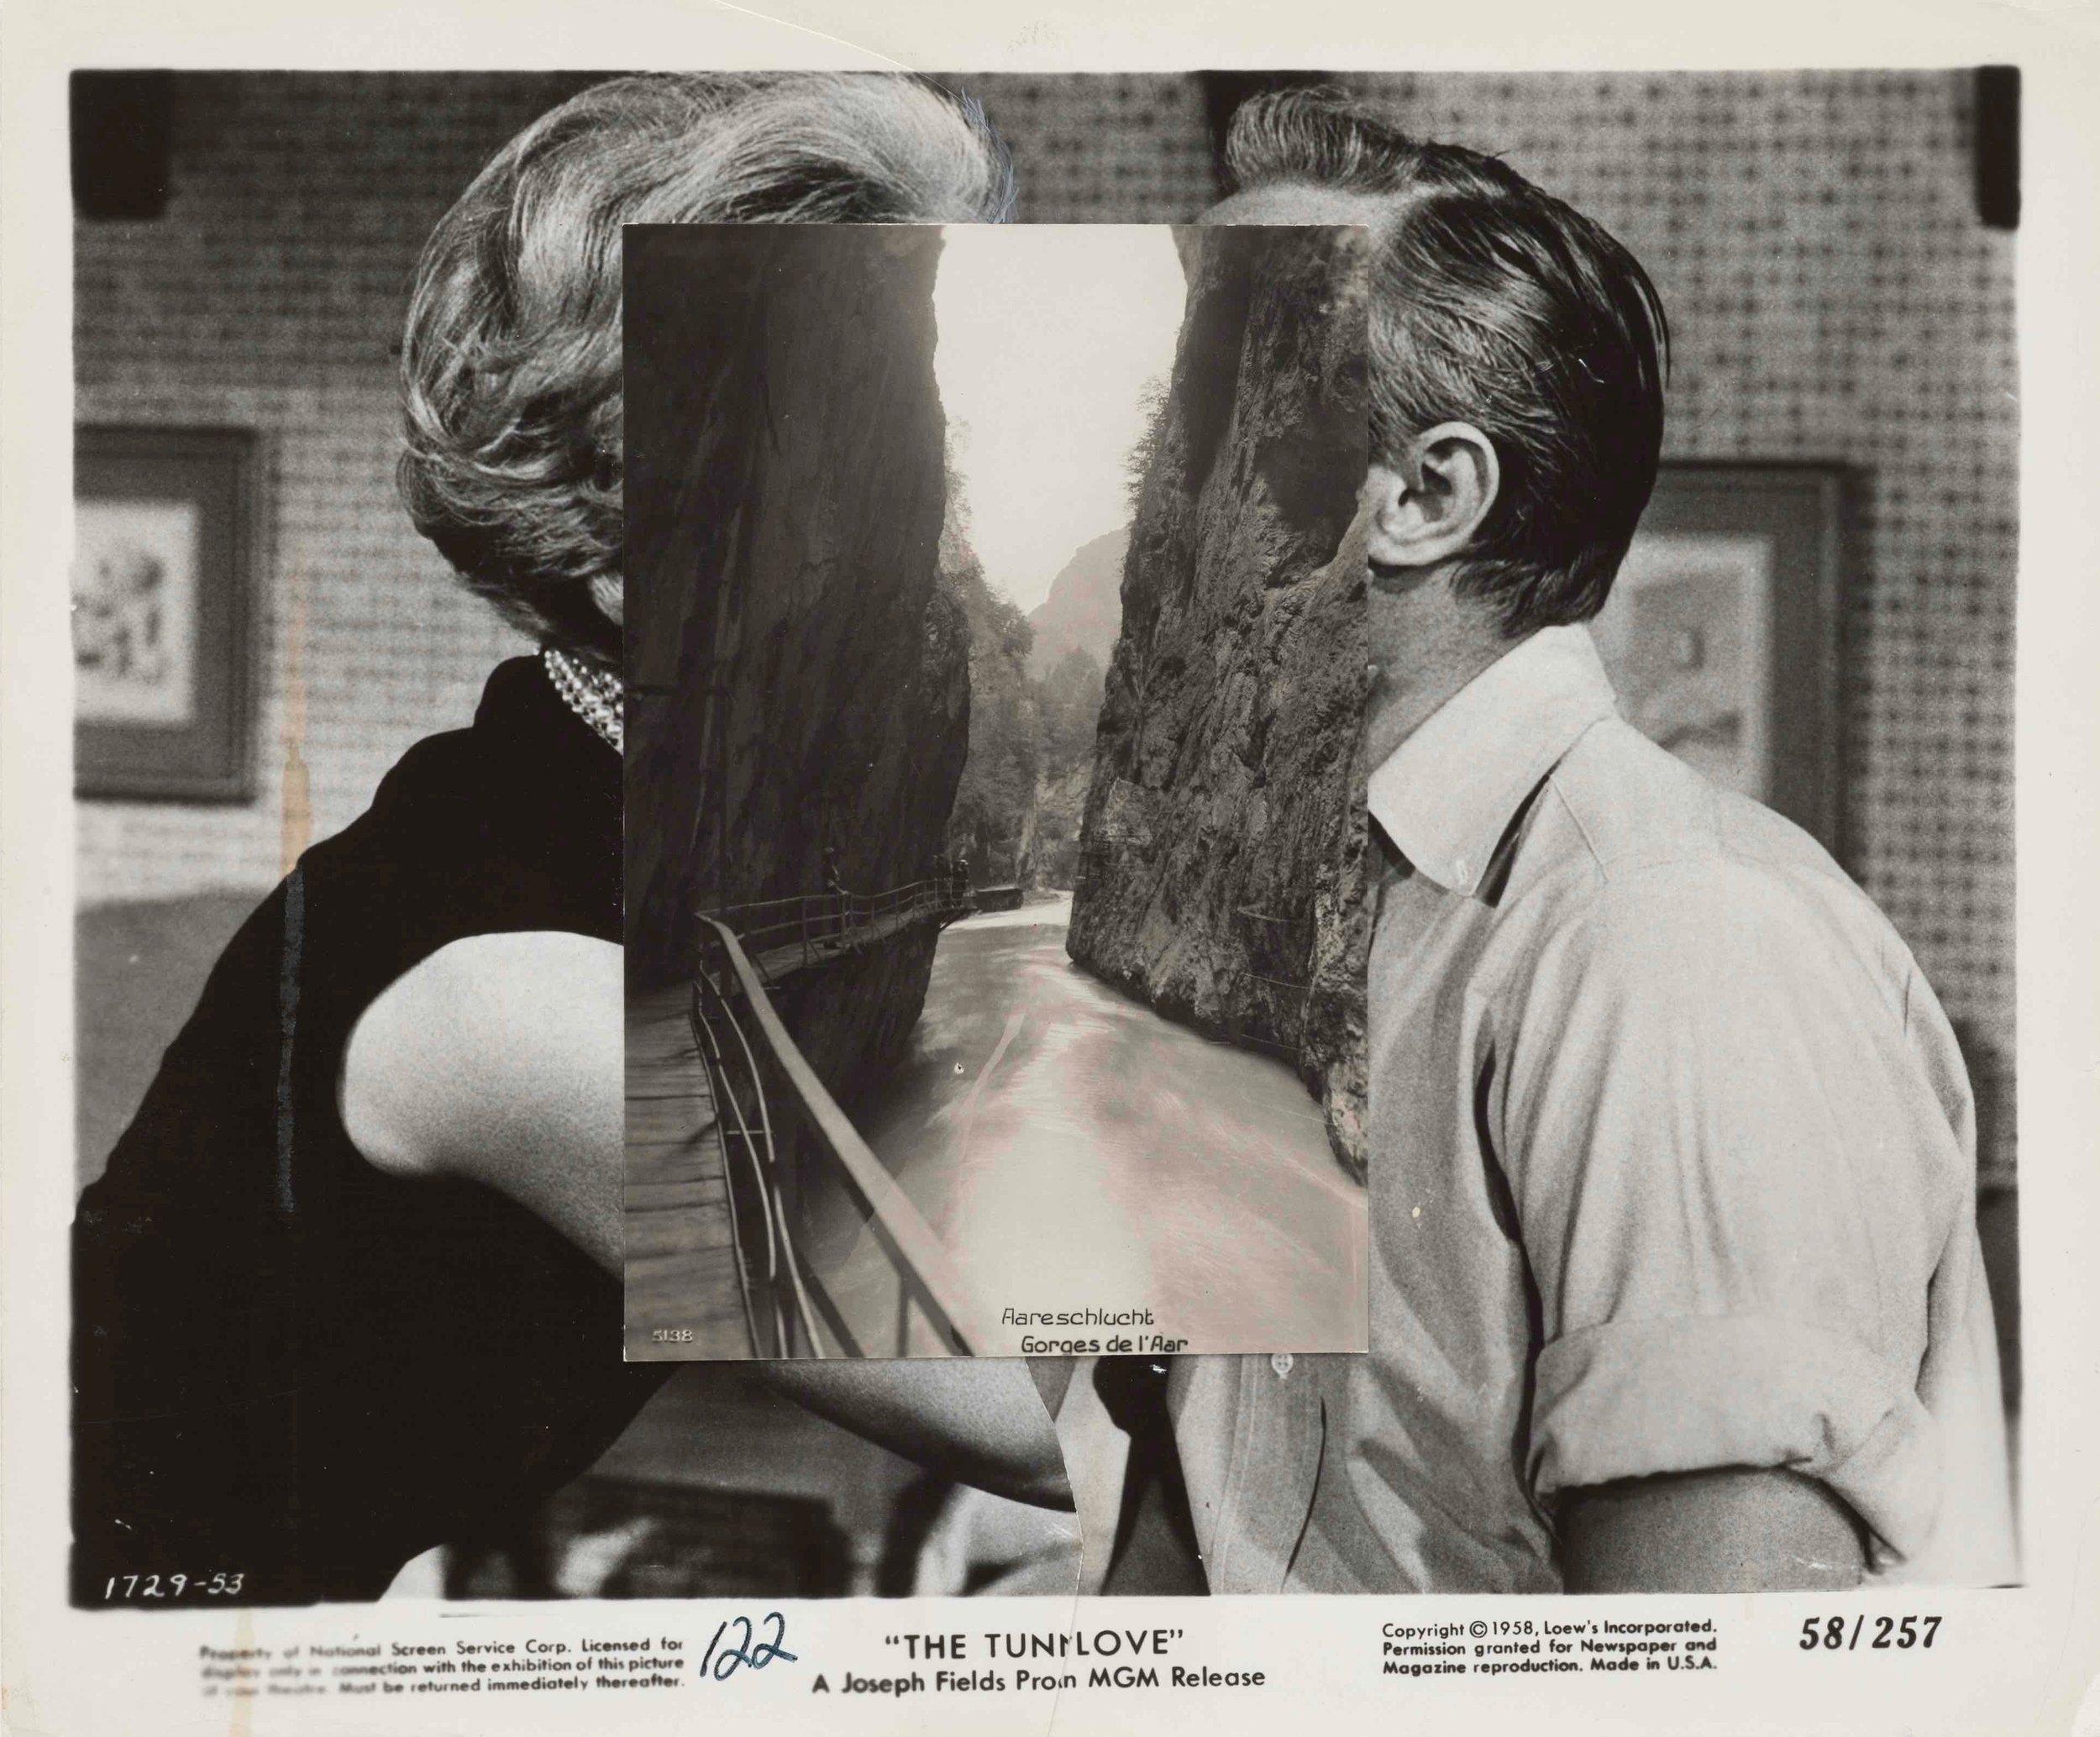 John Stezaker,  Pair XXVII , 2015, collage, 20.3 x 24.2cm; image courtesy the artist and The Approach, London